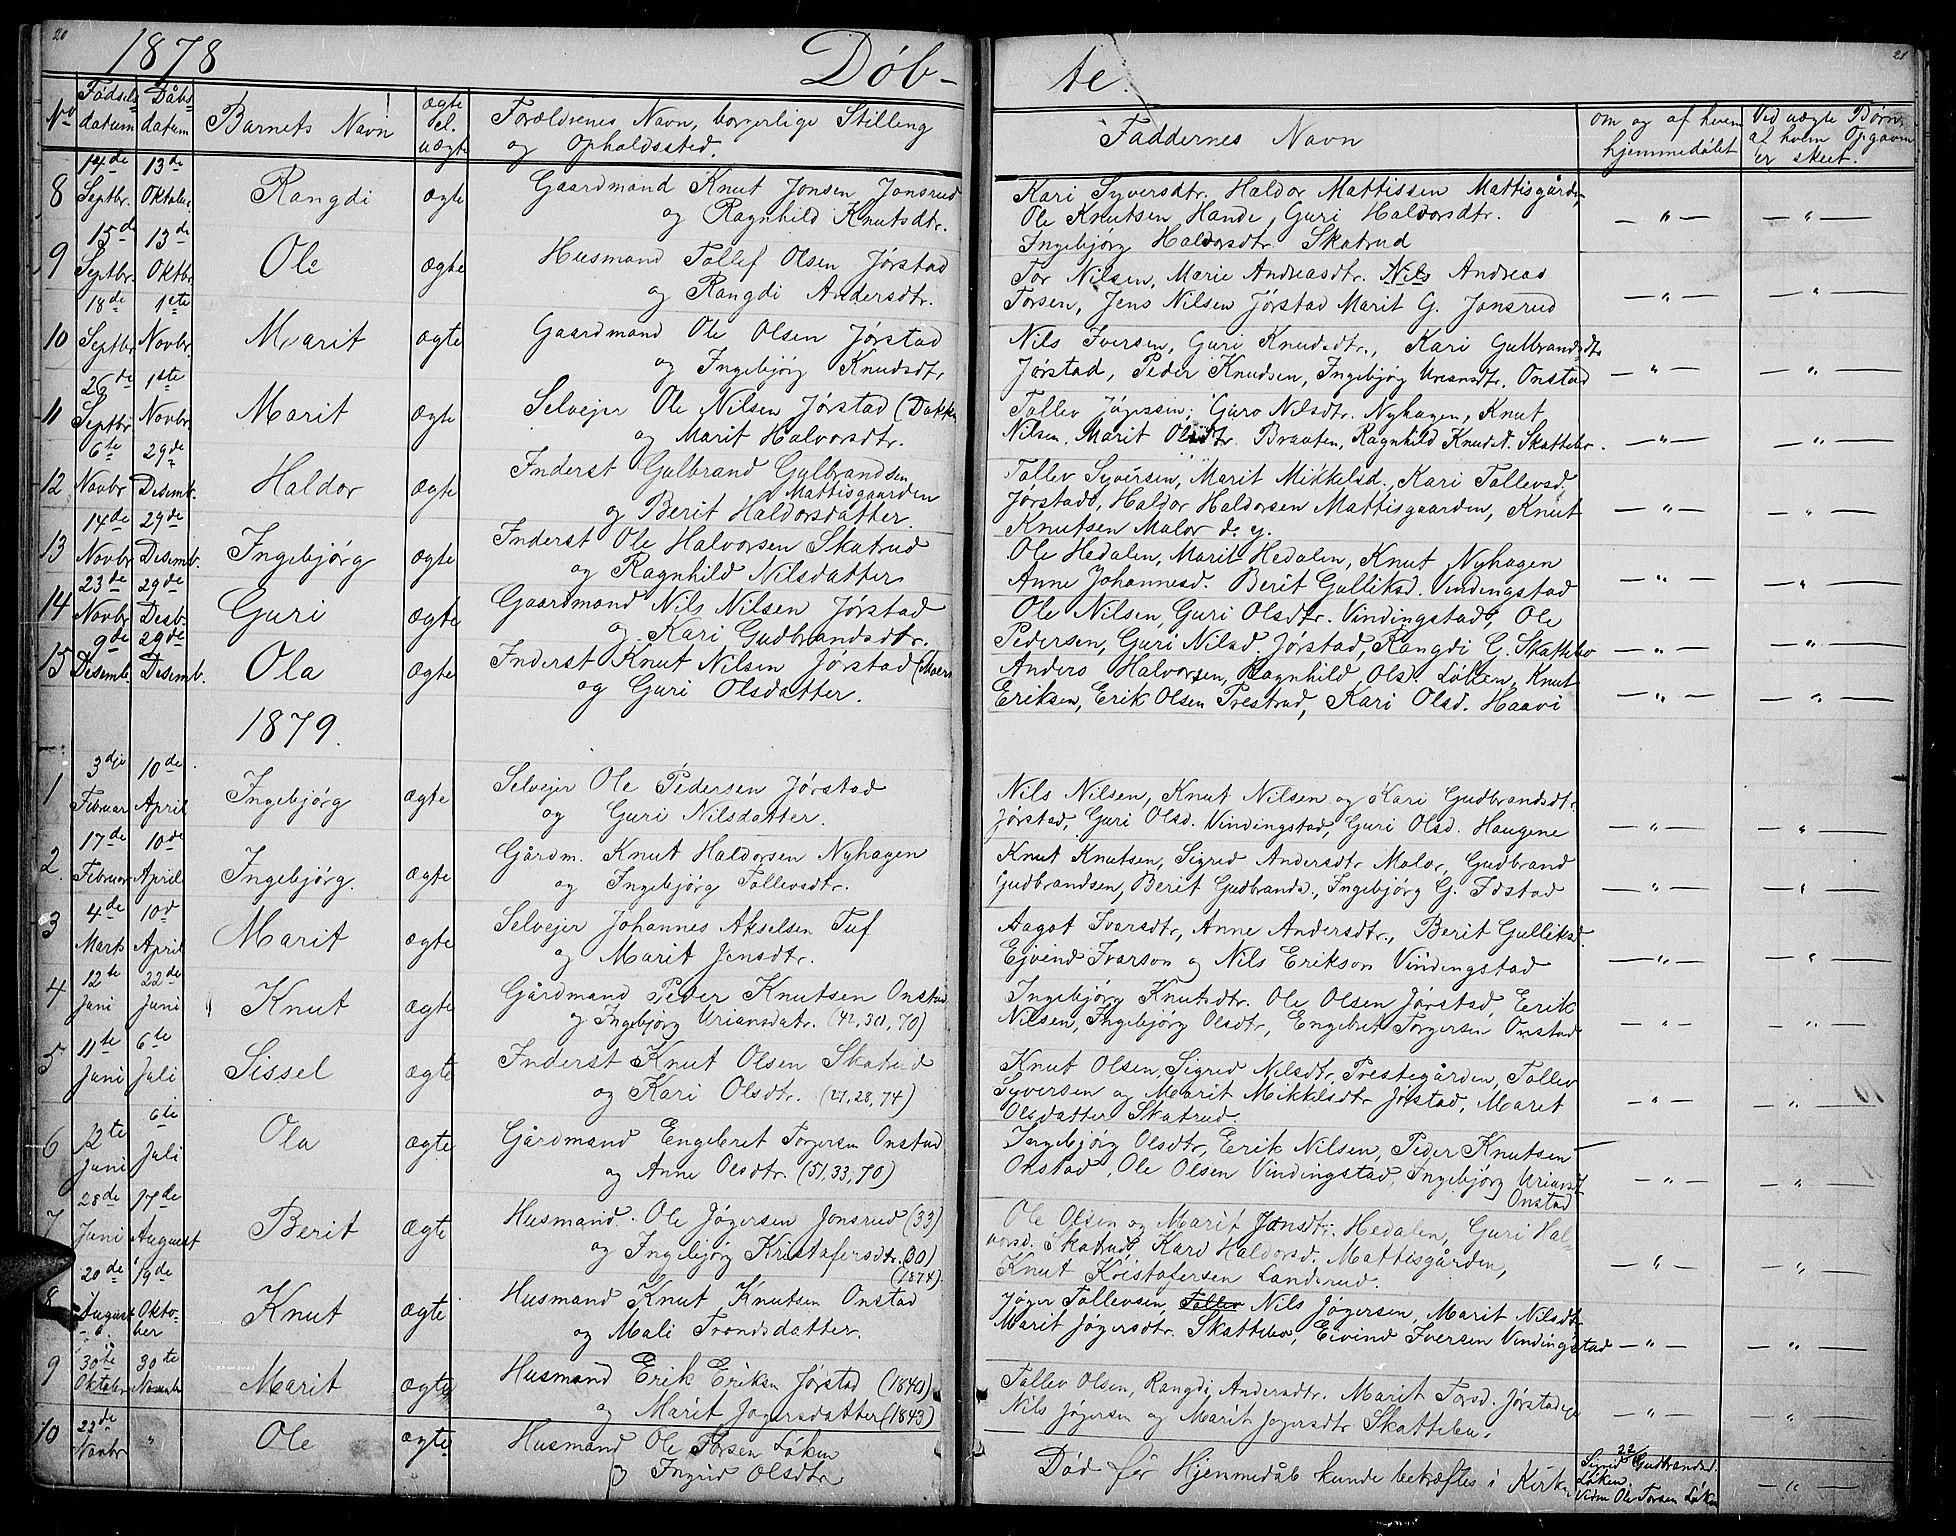 SAH, Øystre Slidre prestekontor, Klokkerbok nr. 2, 1866-1886, s. 20-21